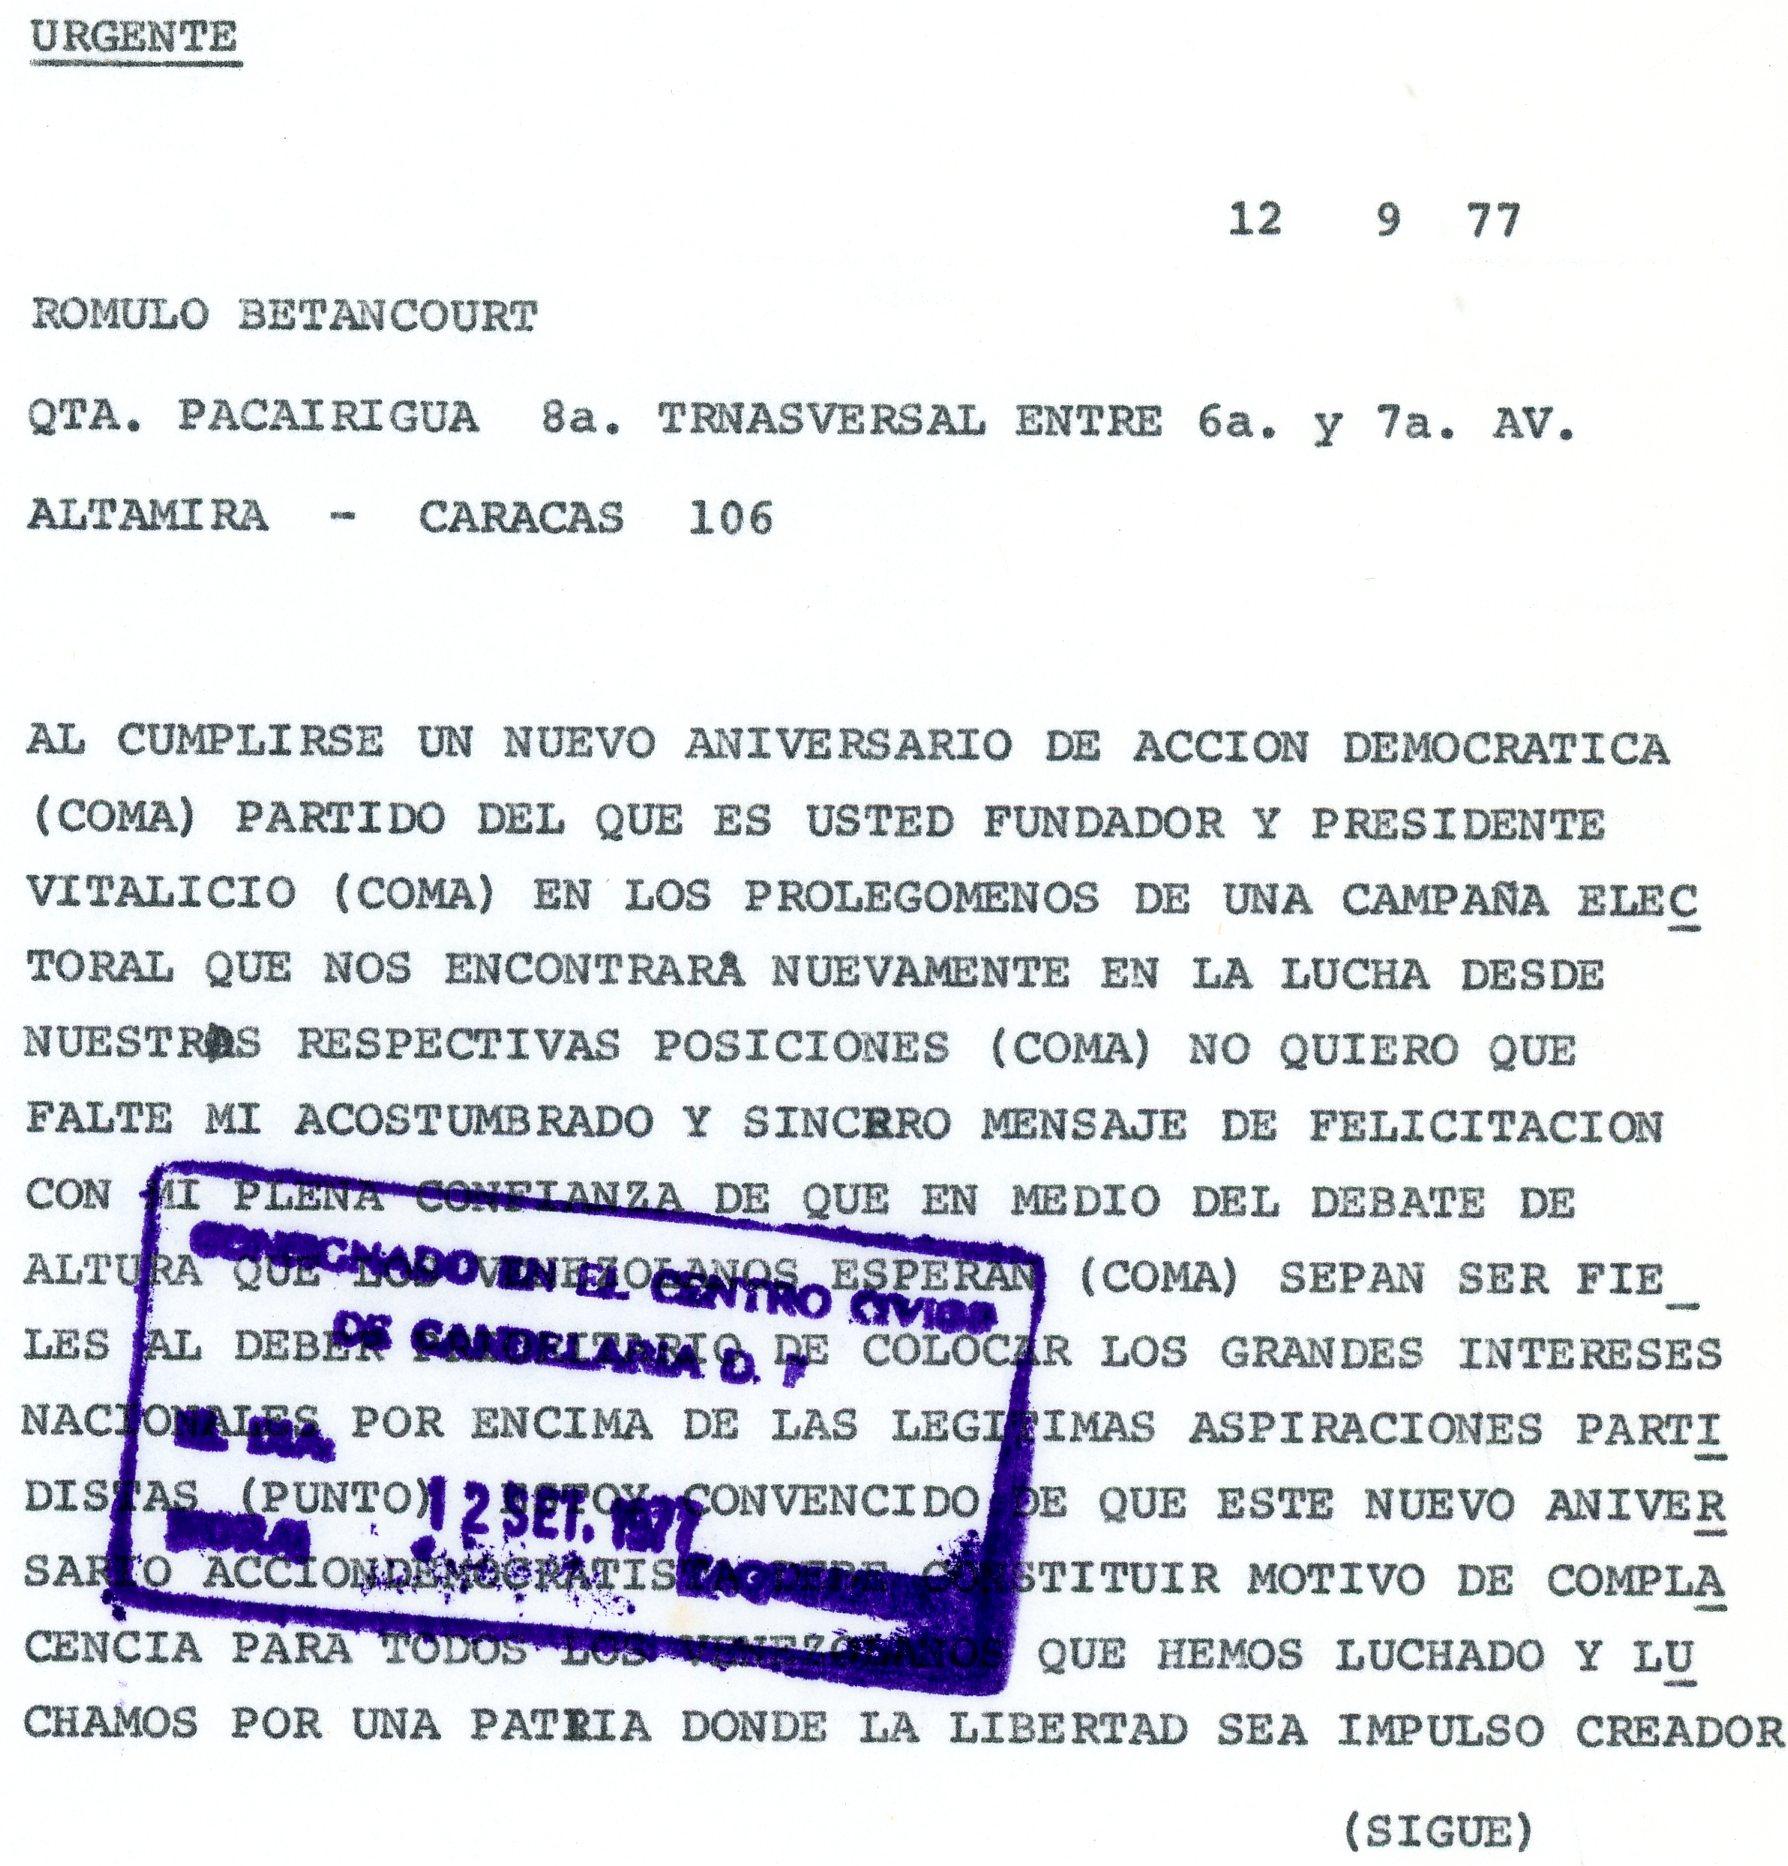 1977. Septiembre, 12. Telegrama de Rafael Caldera a Rómulo Betancourt